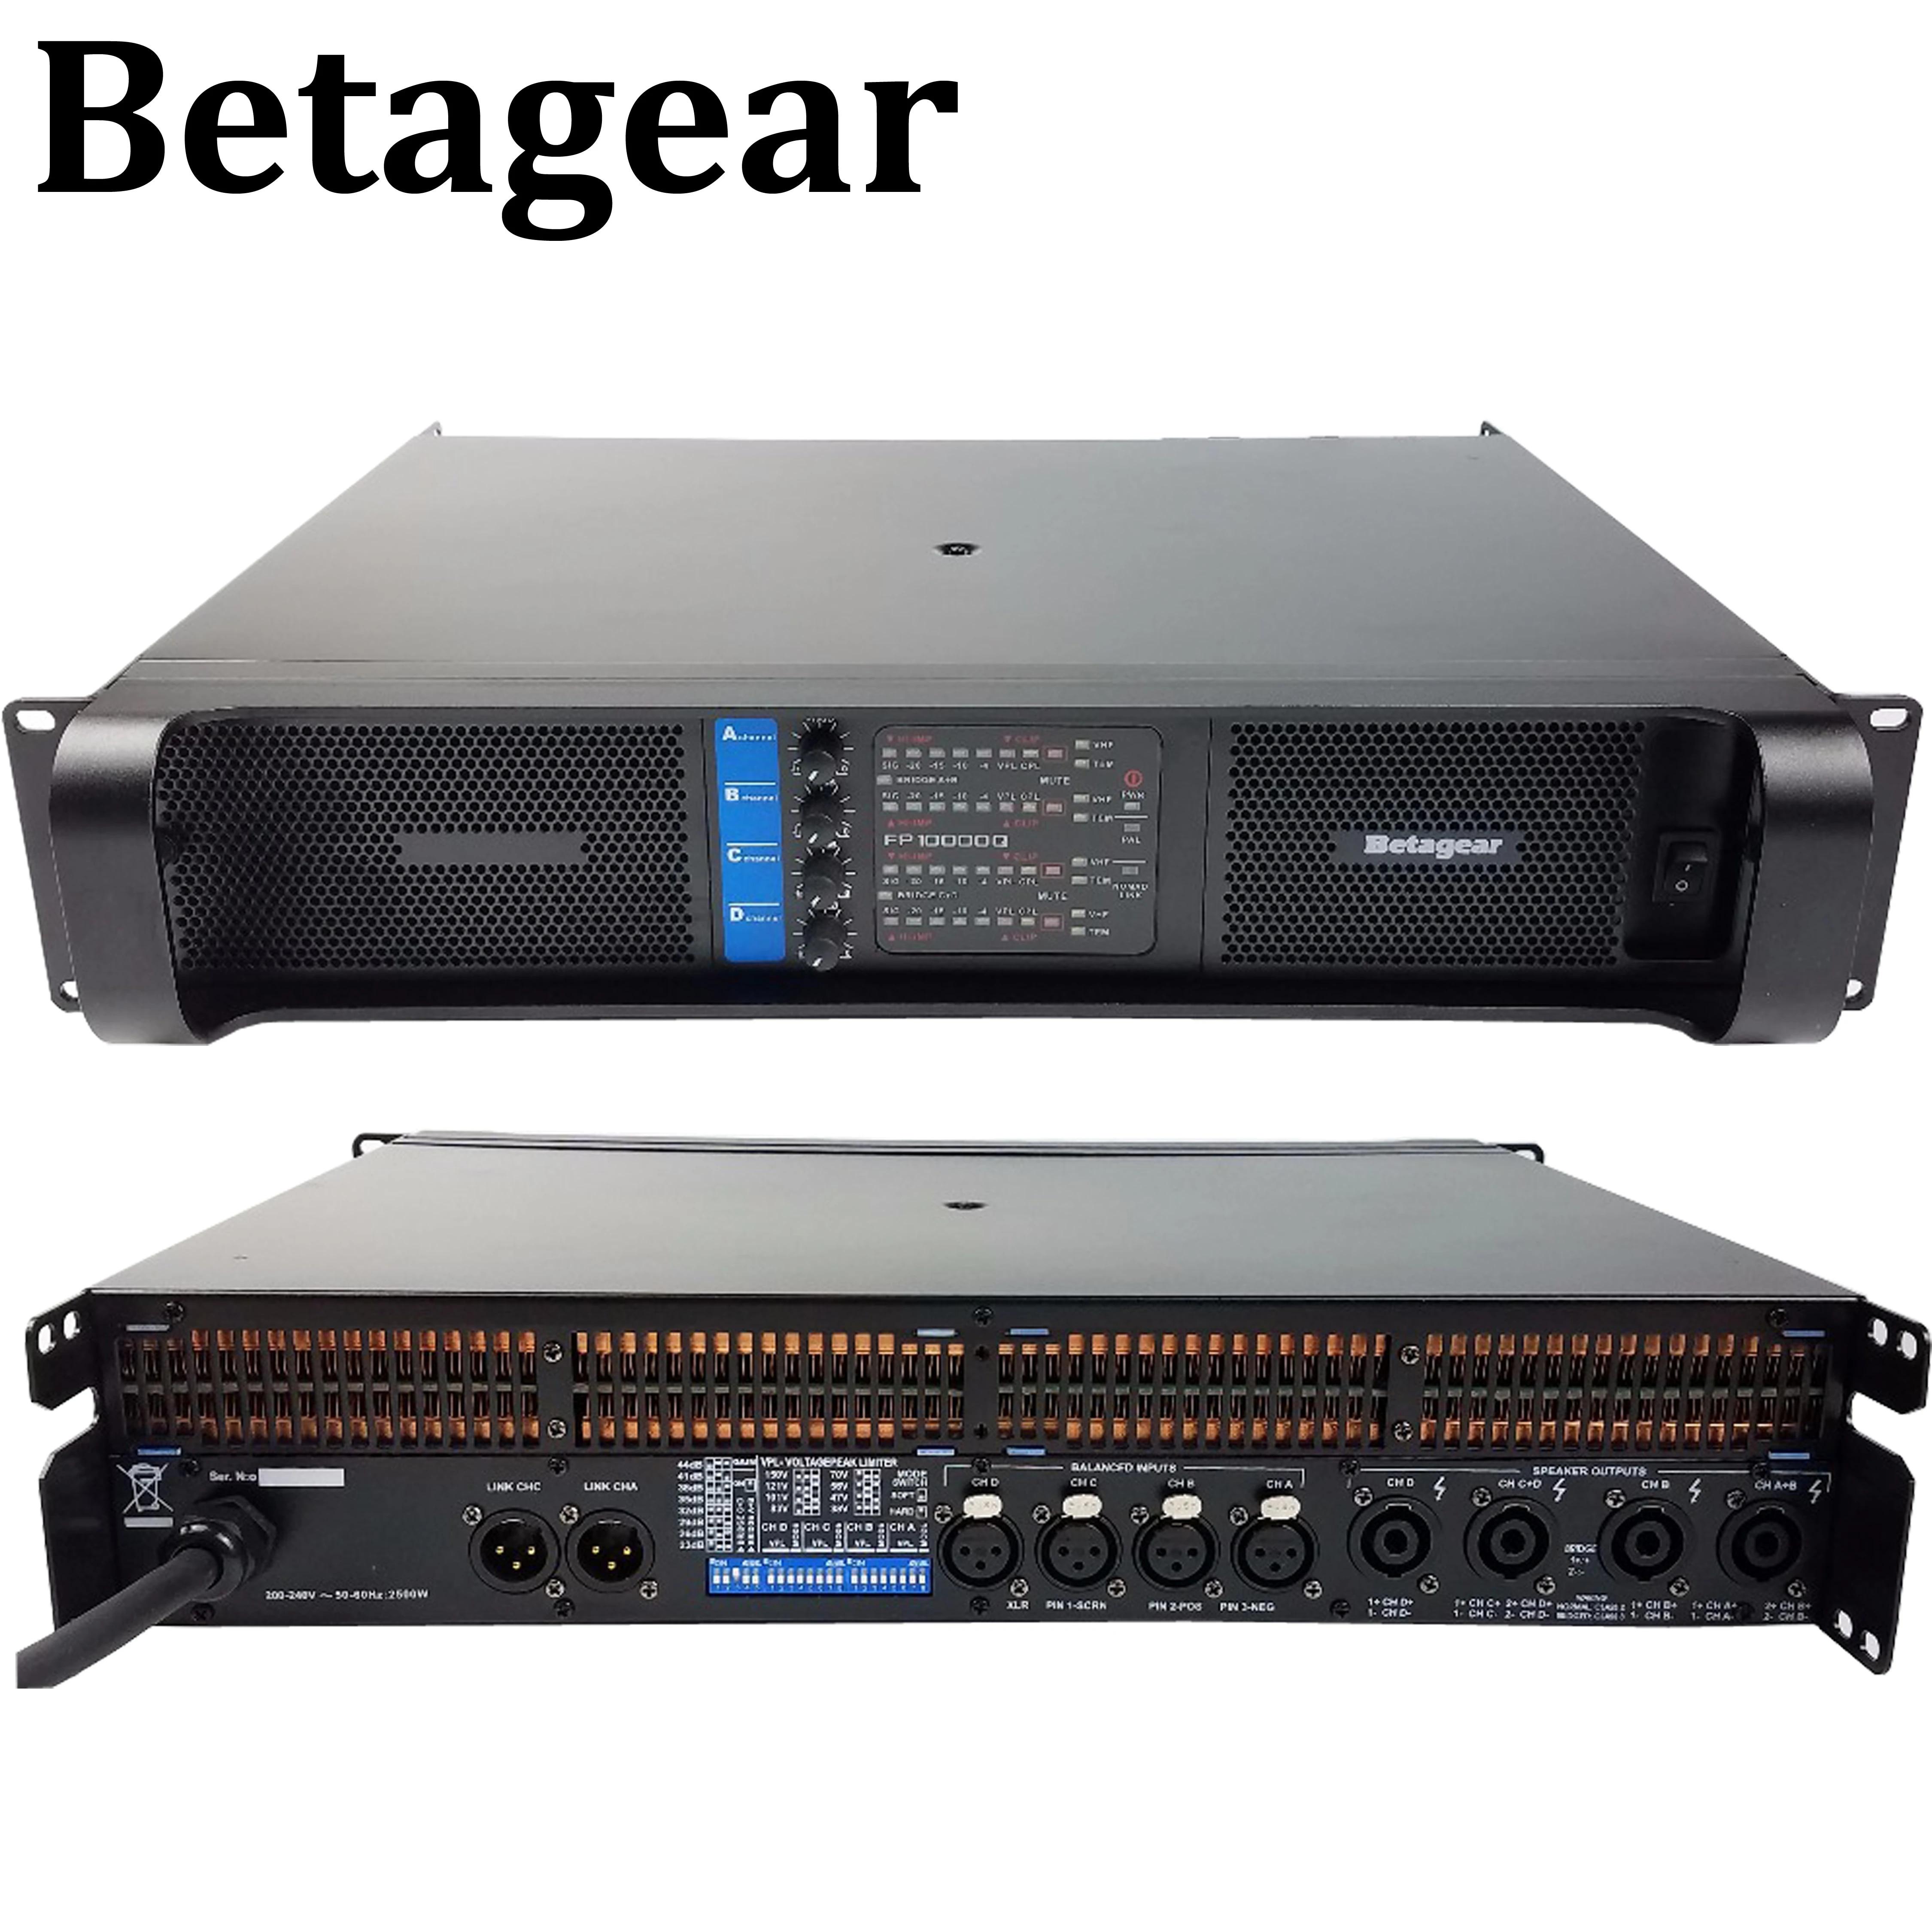 Betagear PF 10000q 2500W * 4 kanal güç amplifikatörü profesyonel fp  subwoofer amplifikatör çizgi dizi amplifikatörler ses amplificador|Stage  Audio